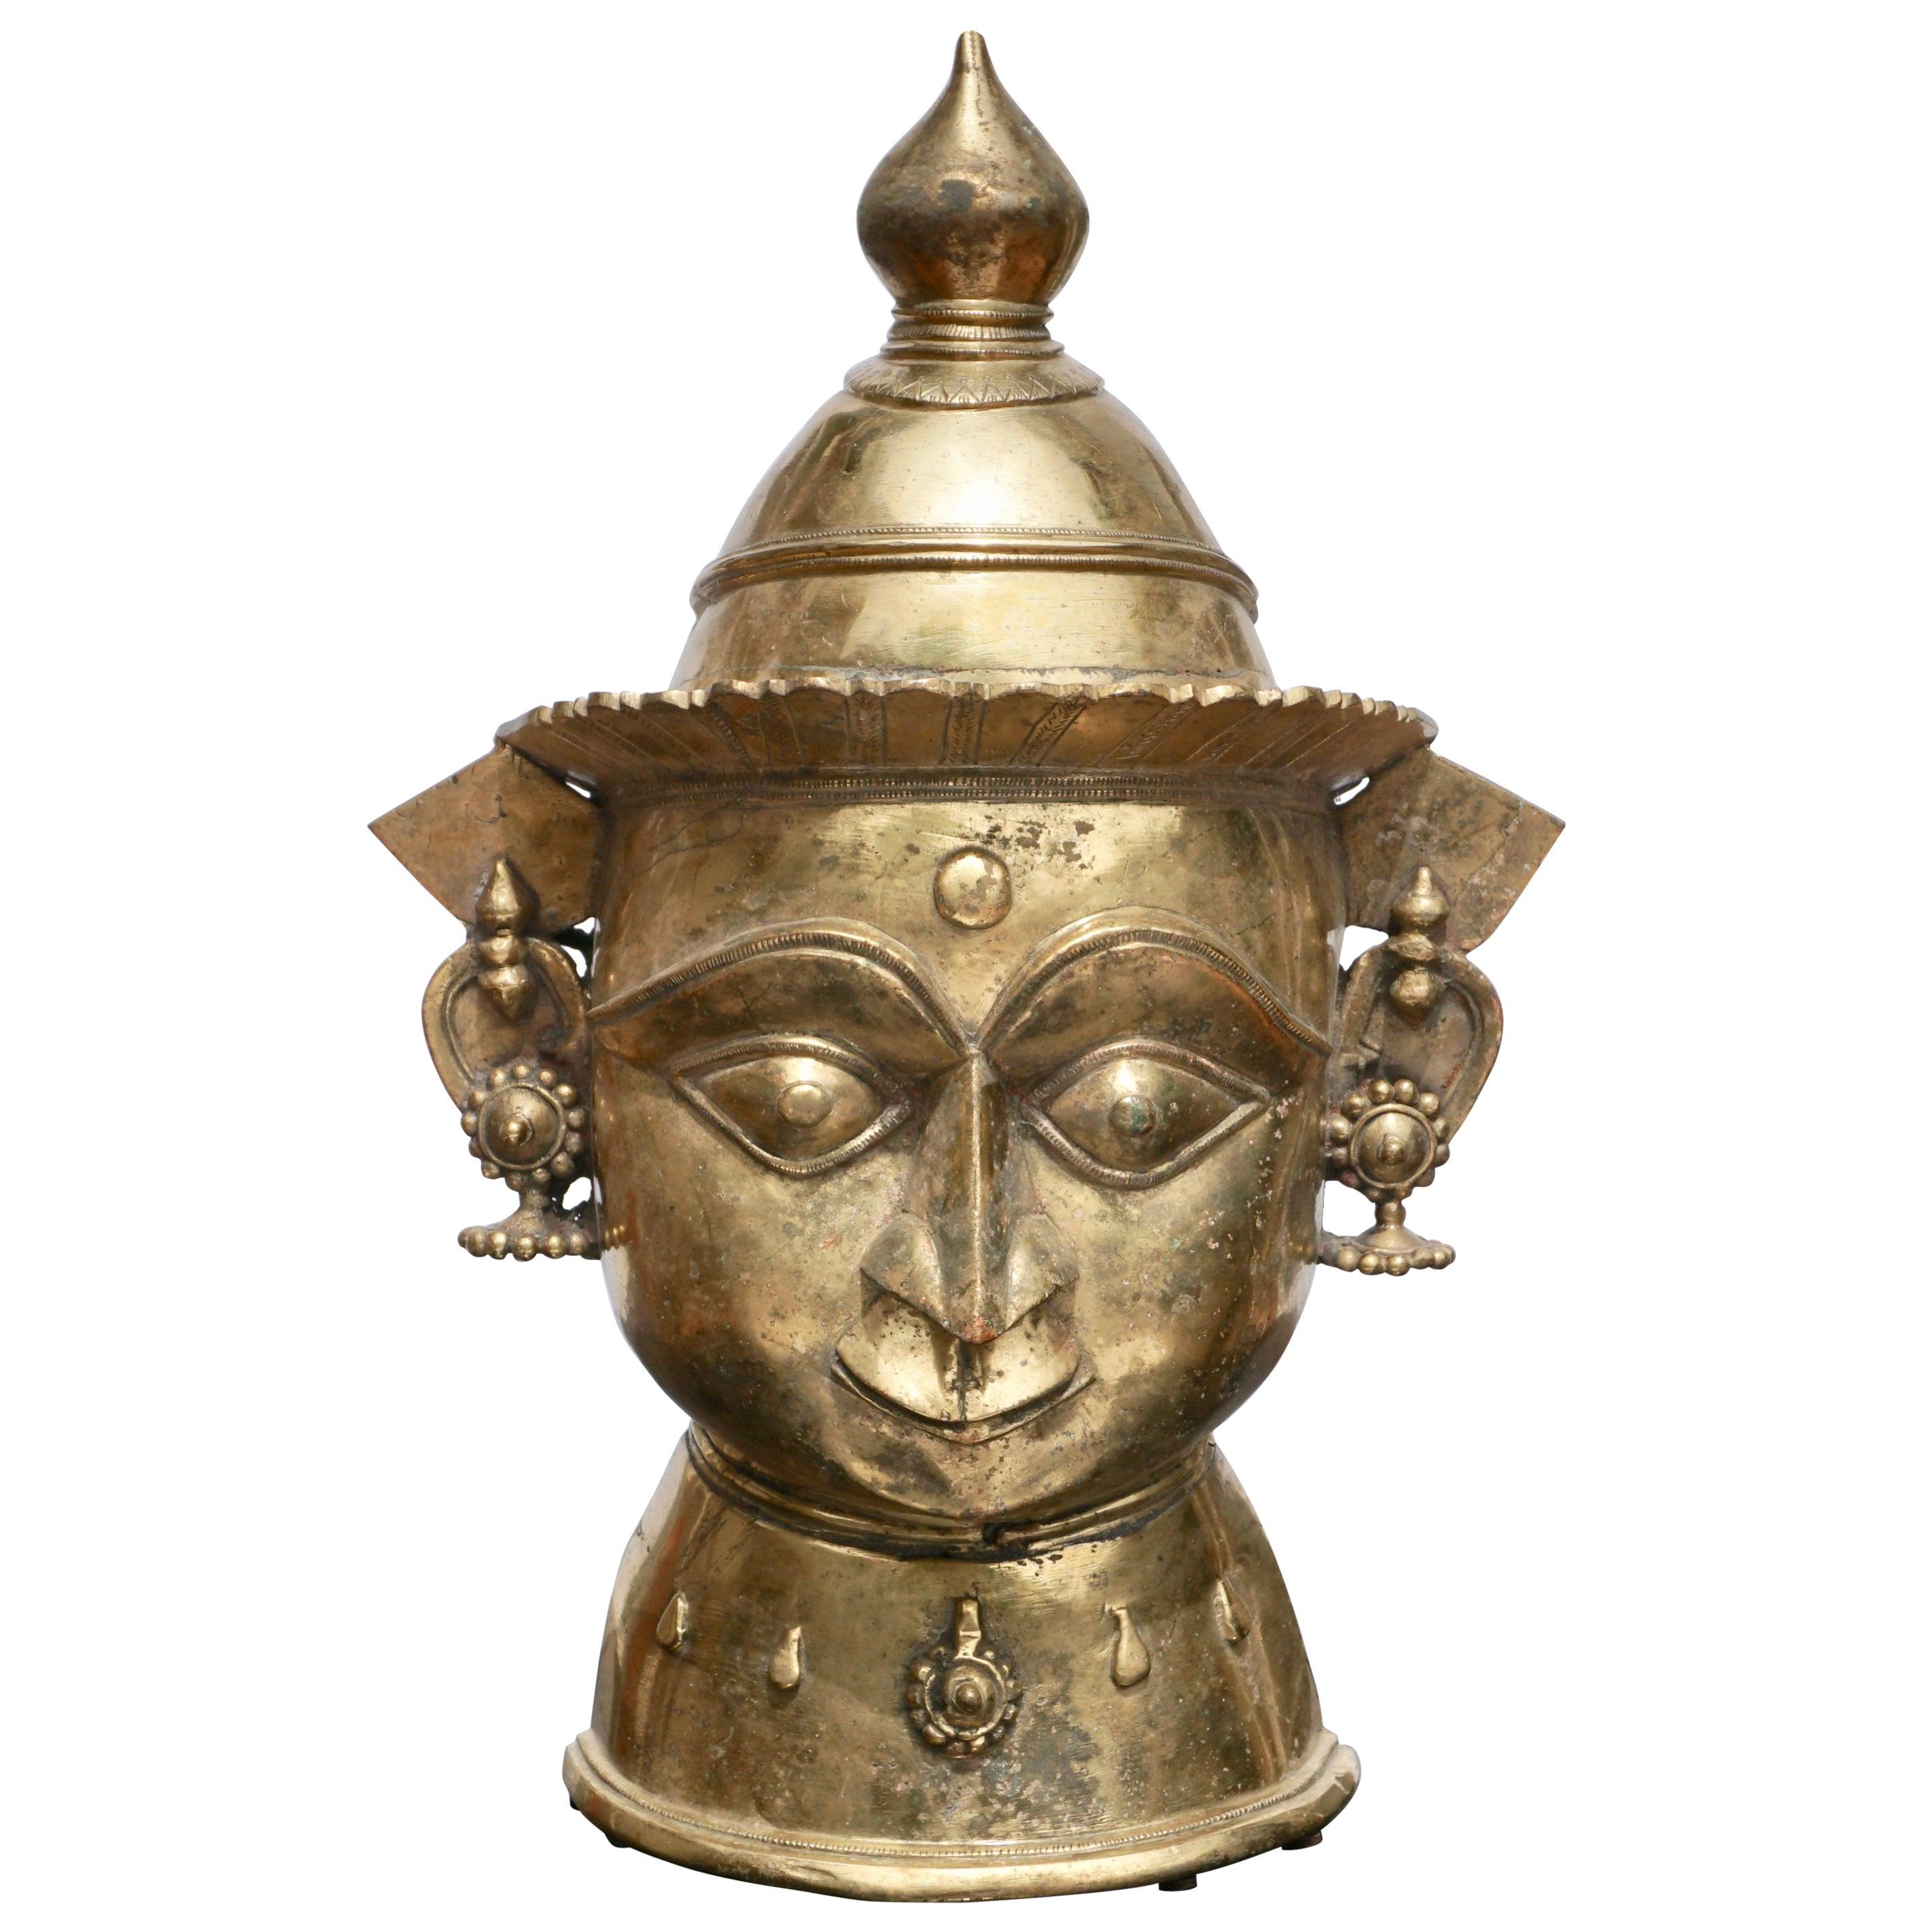 Large 17th-18th Century Indian Mukhalingam Gilt Bronze Mask